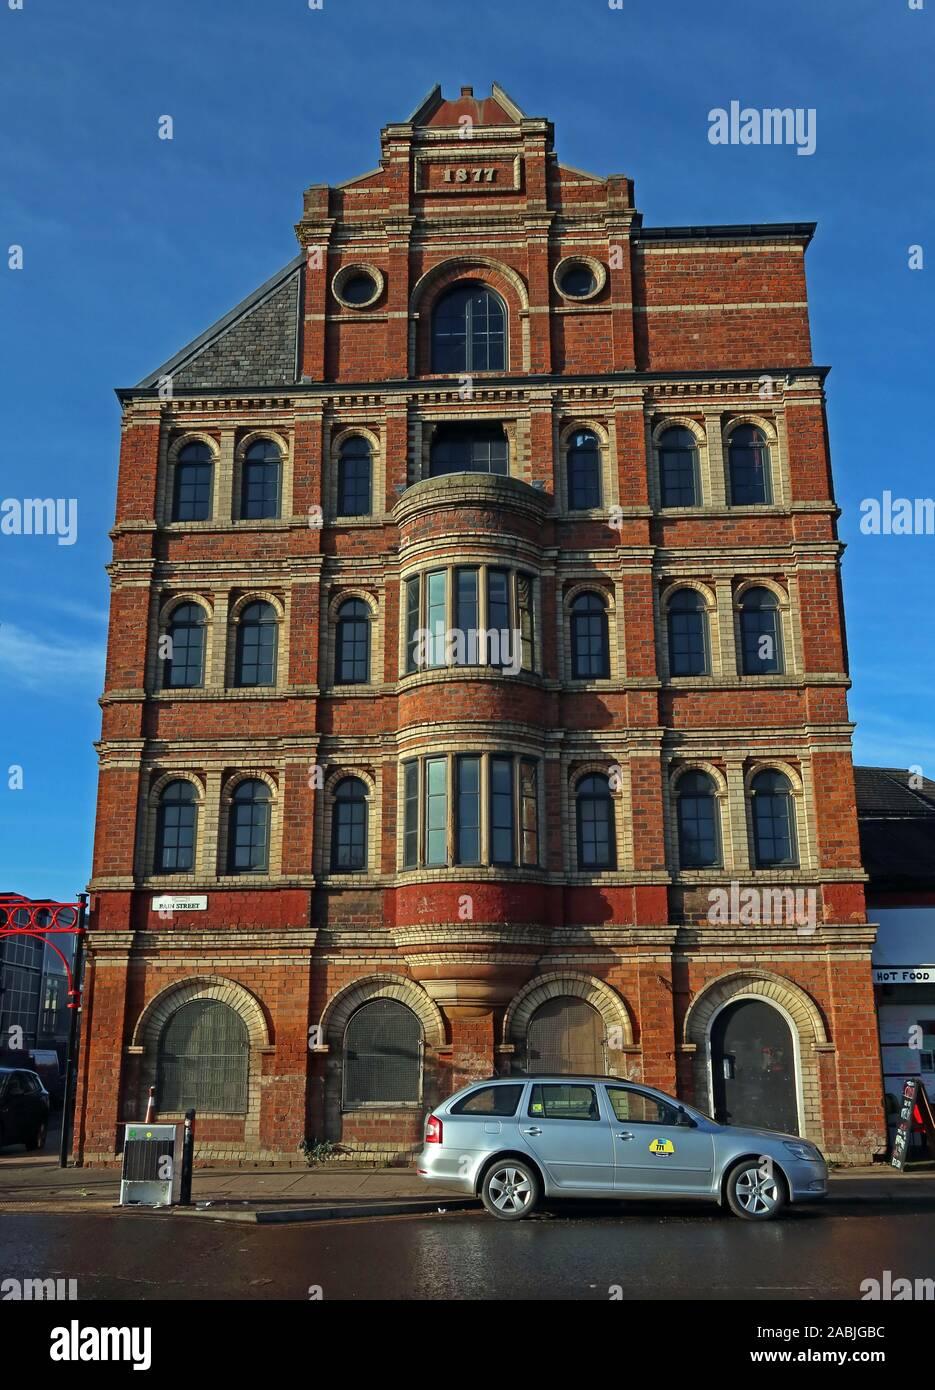 @HotpixUK,HotpixUK,GoTonySmith,UK,Glasgow,Scotland,City Centre,Strathclyde,The Barras,Markets,Gallowgate,G1,G1 5DX,Calton,brick,five story,building,1877